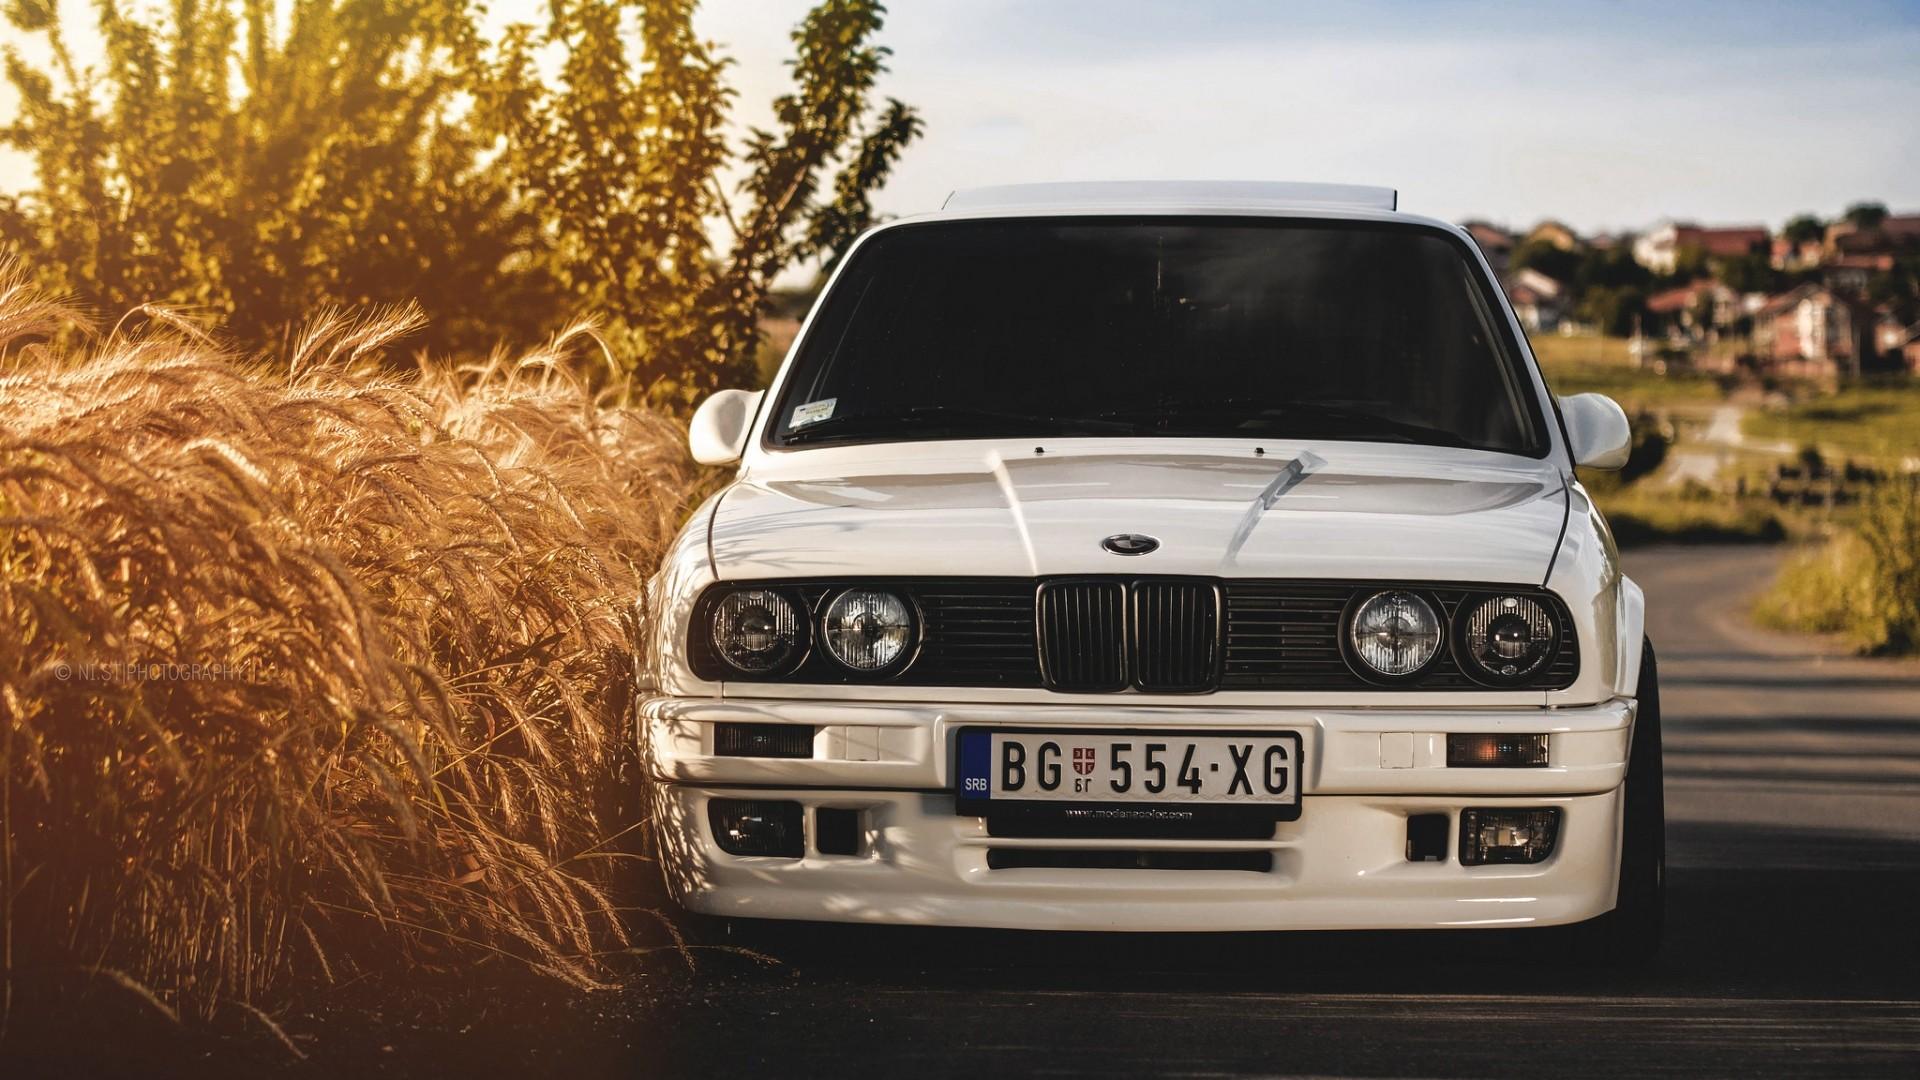 Hd Cars Wallpapers 1080p Wallpapertag